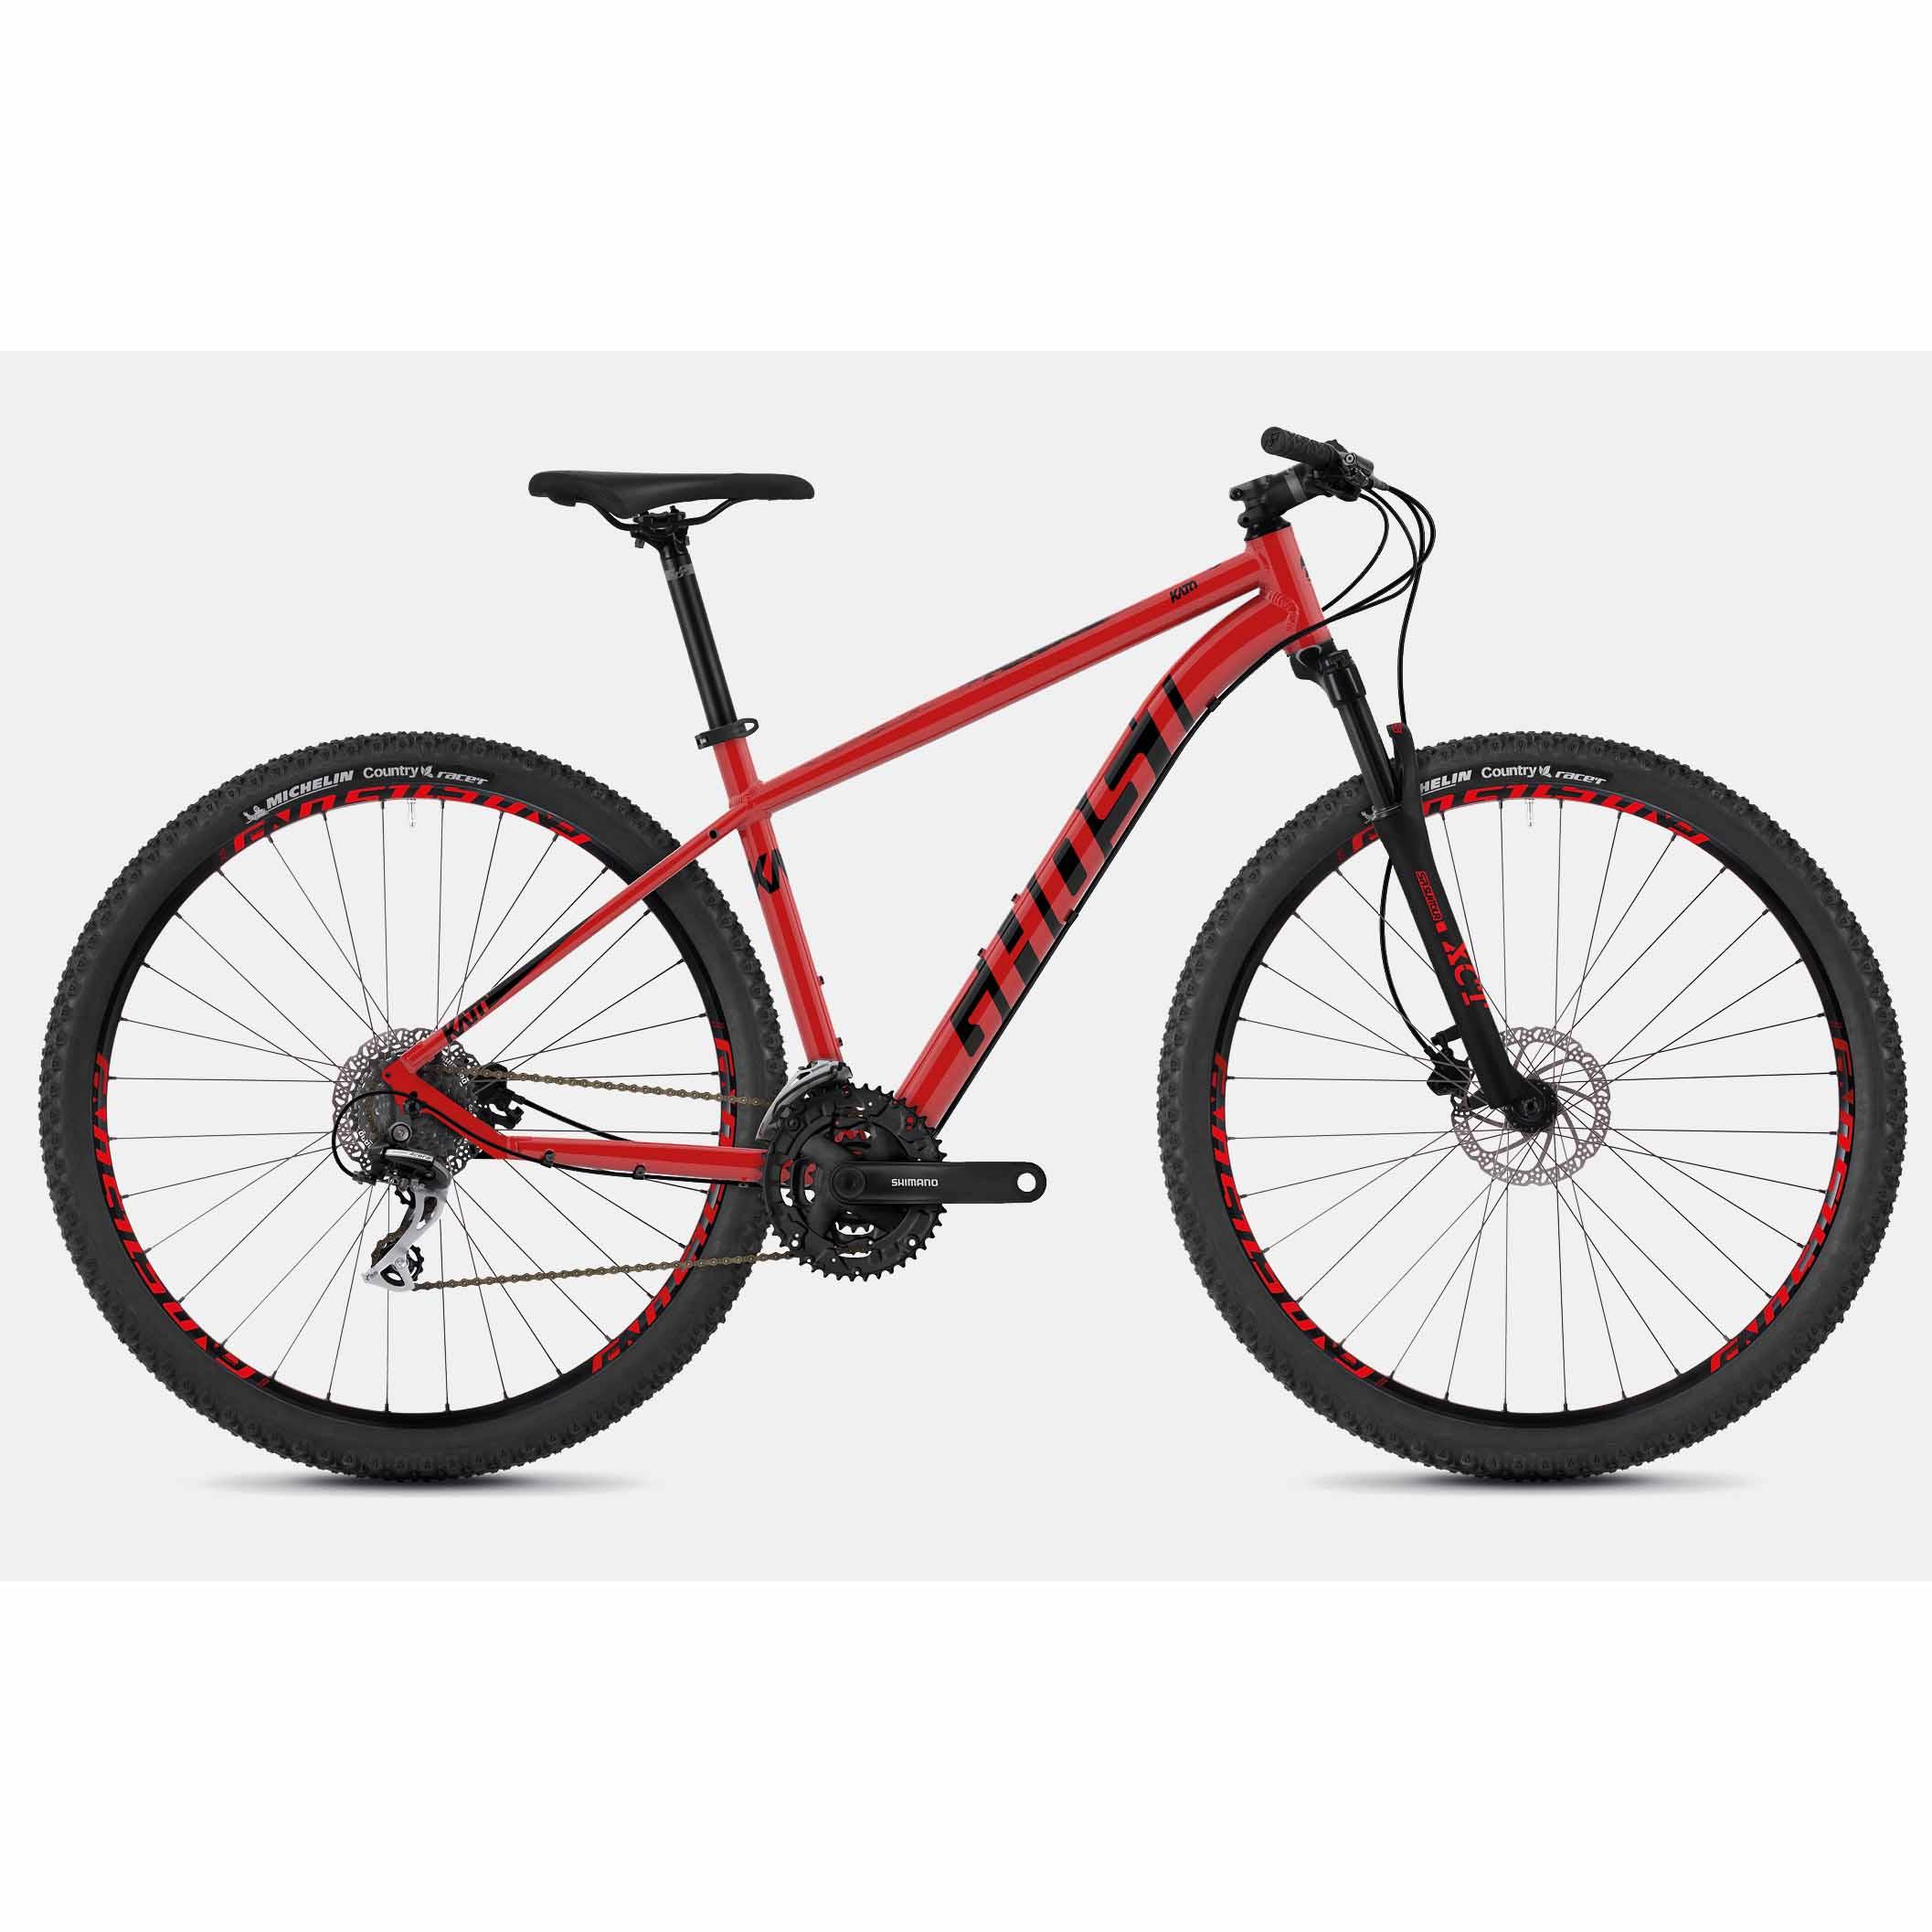 Фото Велосипед Ghost Kato 2.9 29″ , рама S, красно-черный , 2019